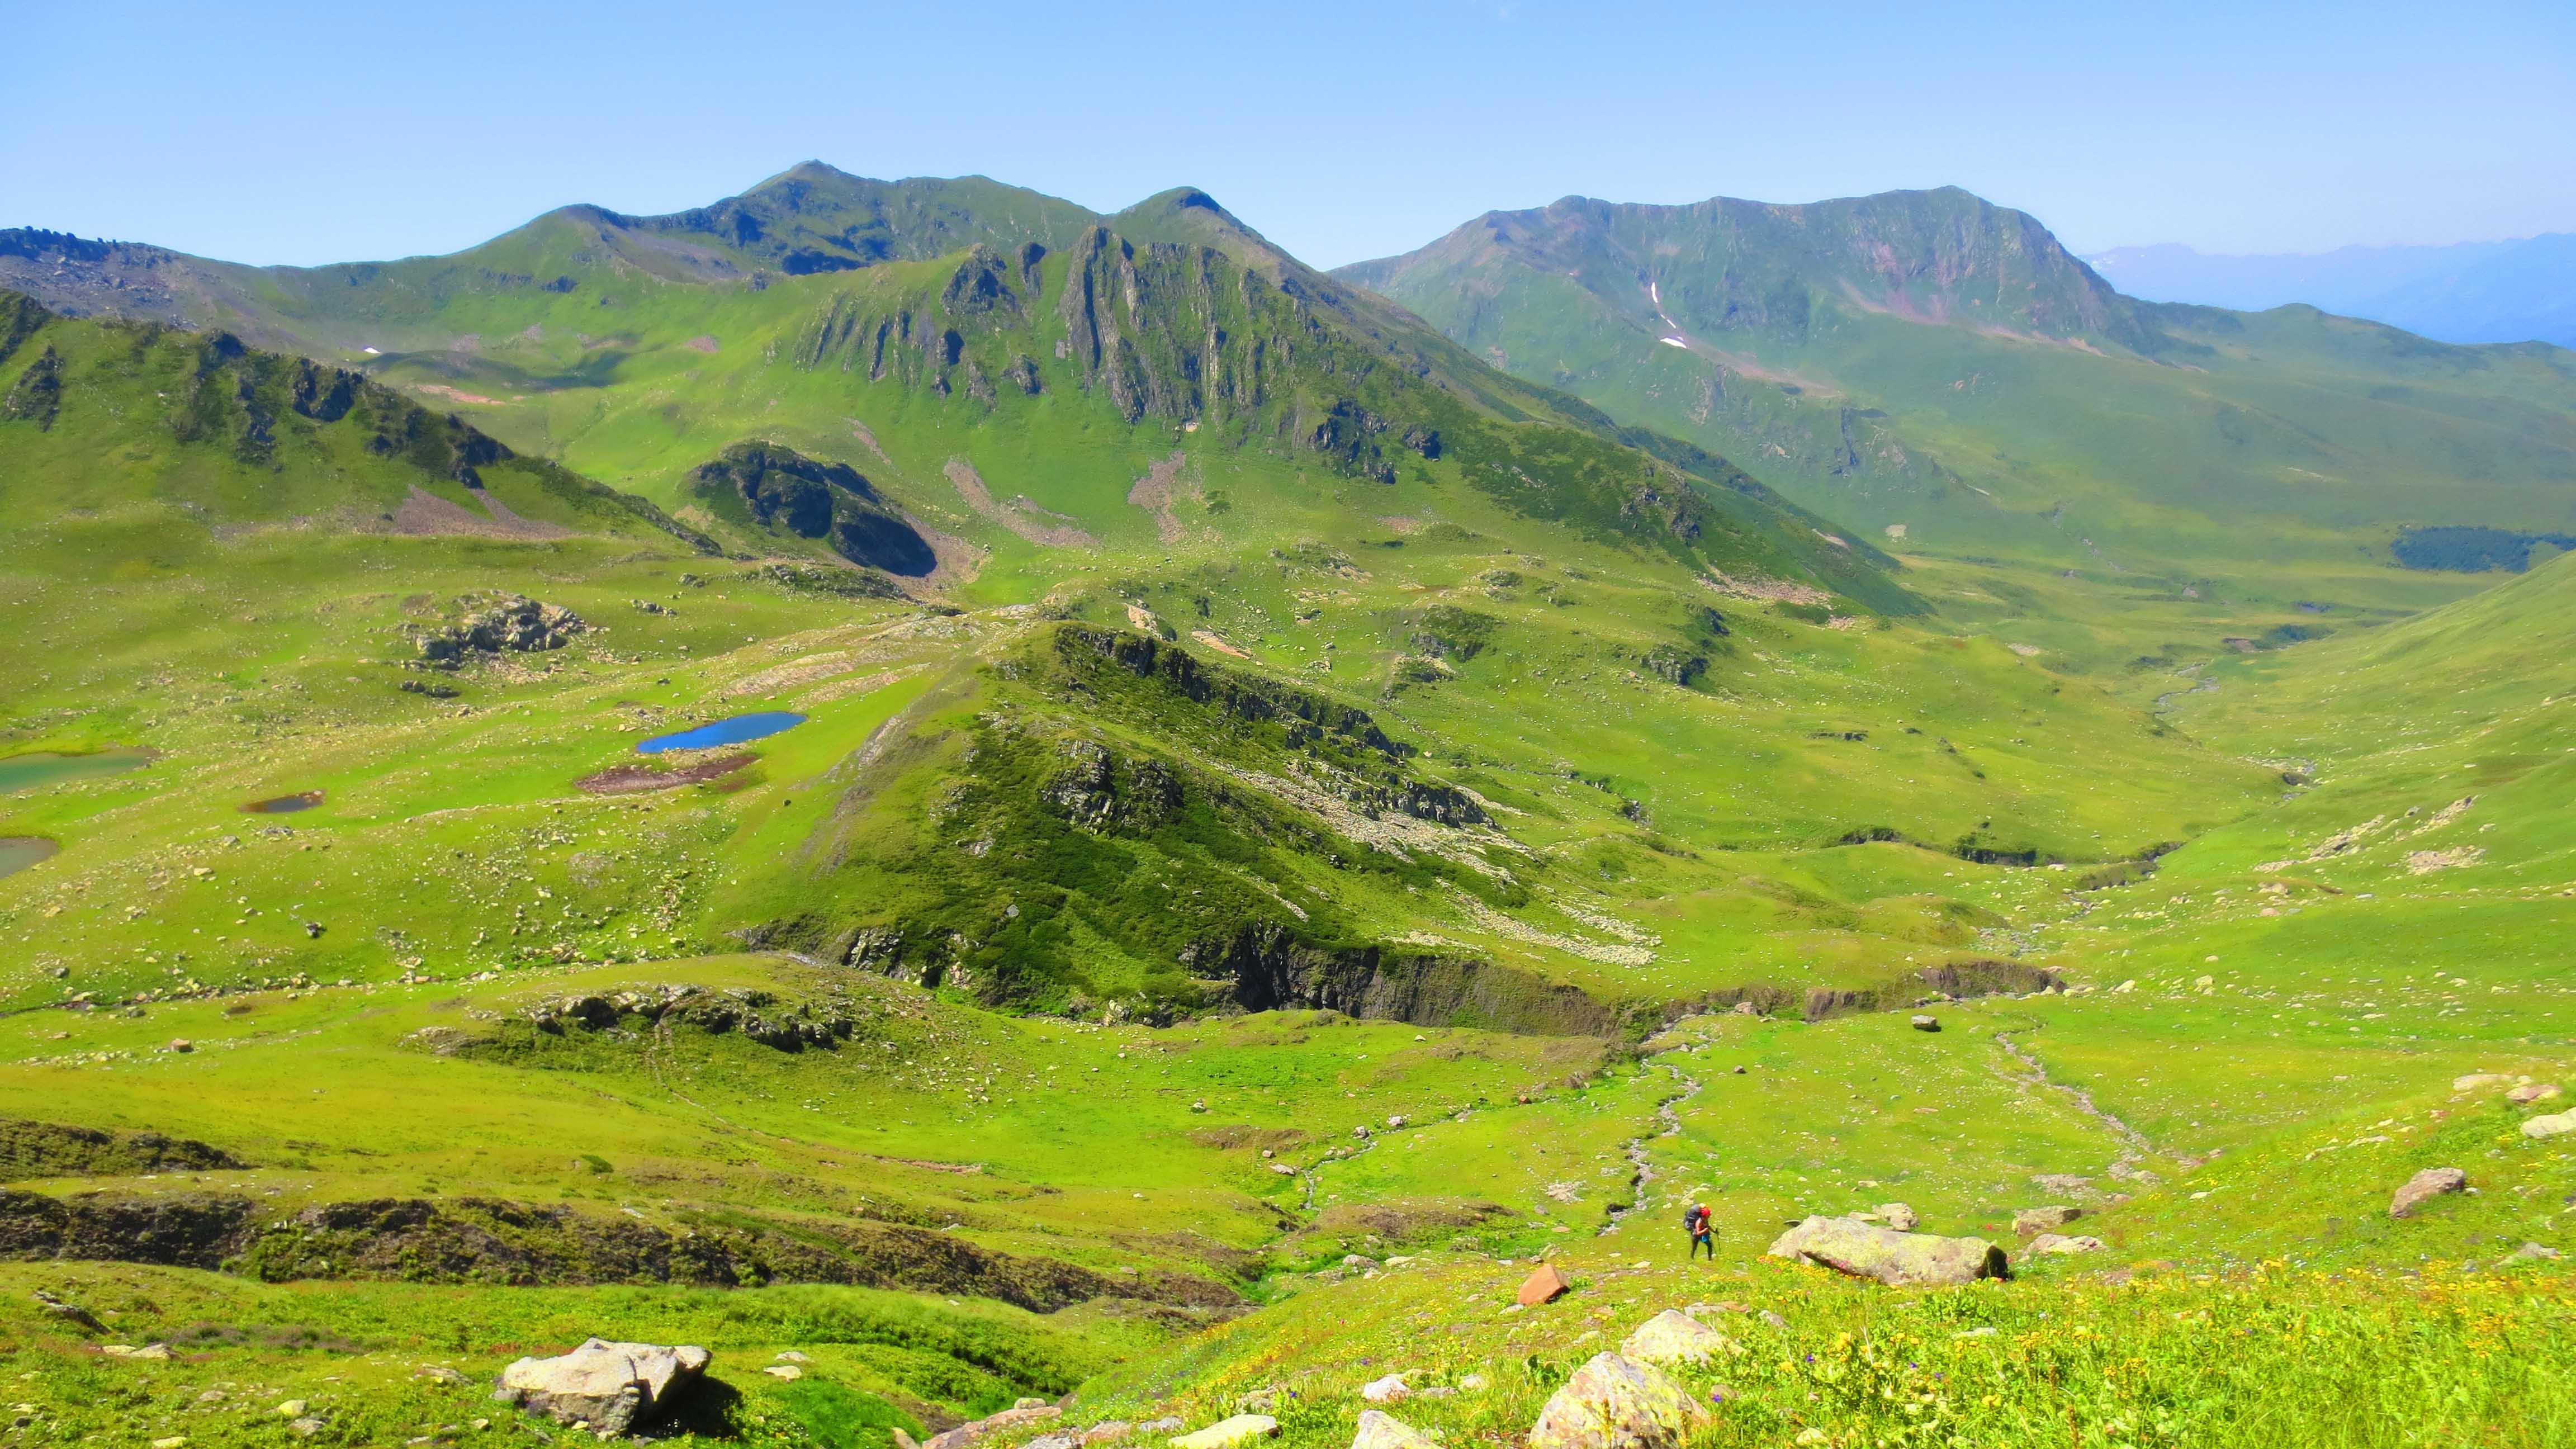 Hiking in the region of Racha